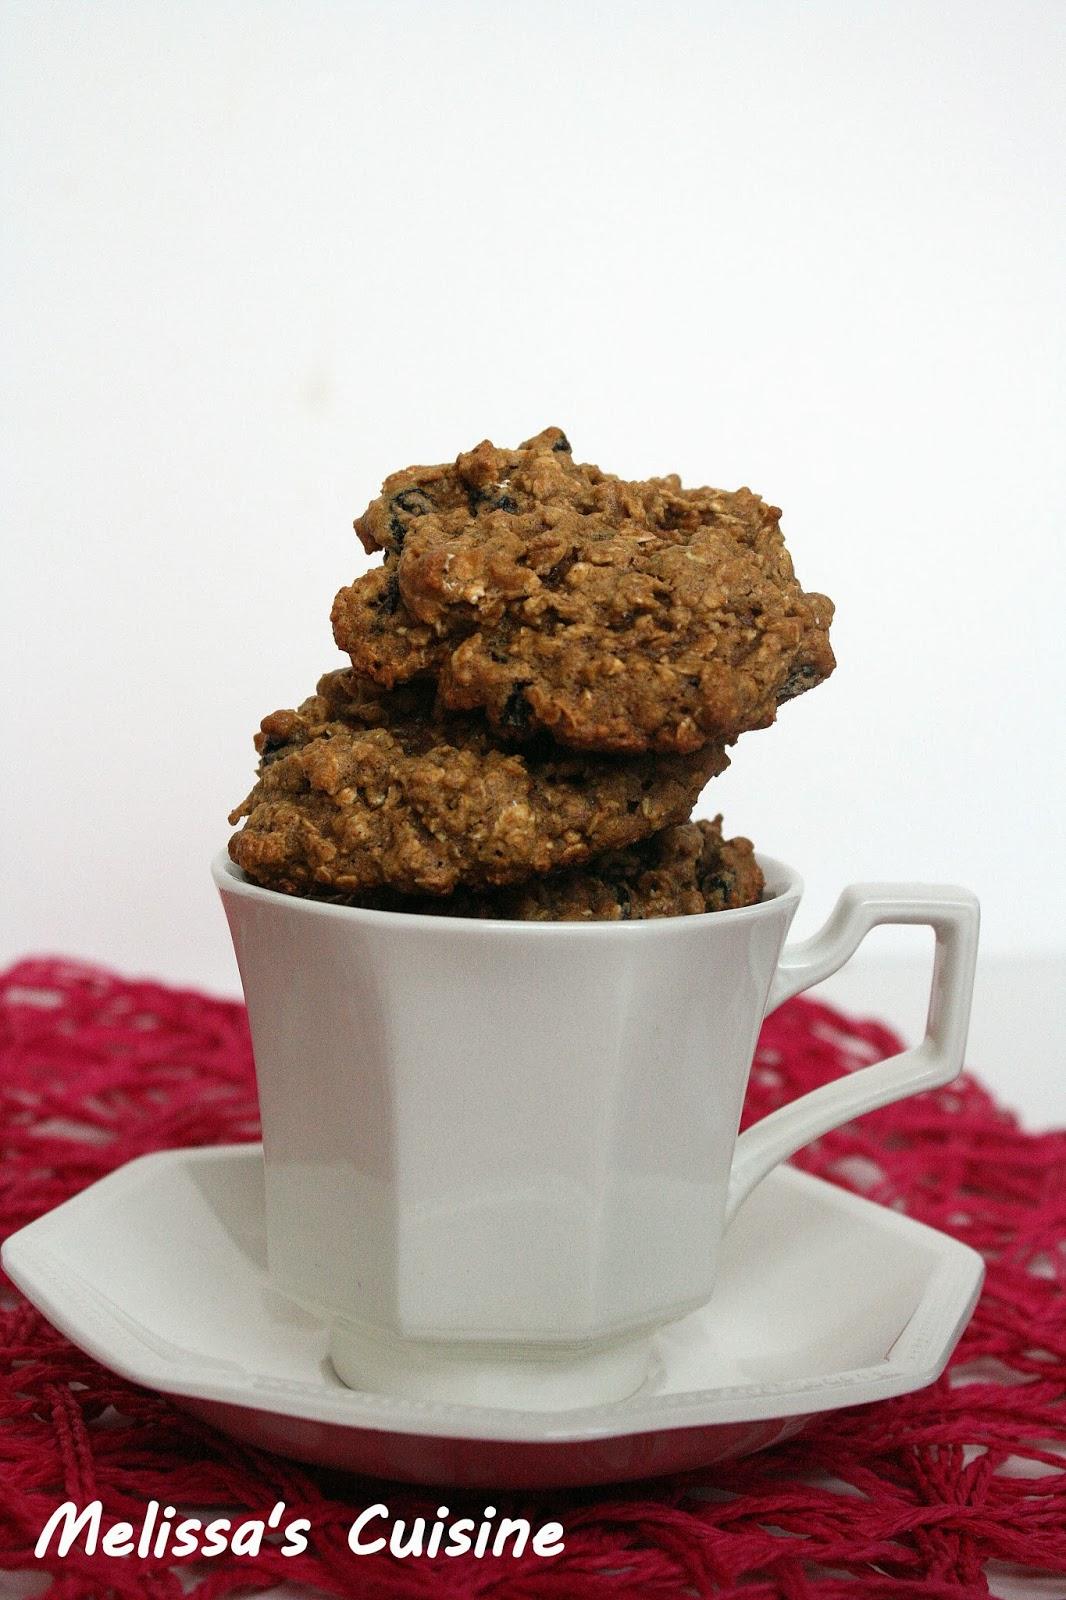 Melissa's Cuisine:  Healthier Oatmeal Raisin Cookies